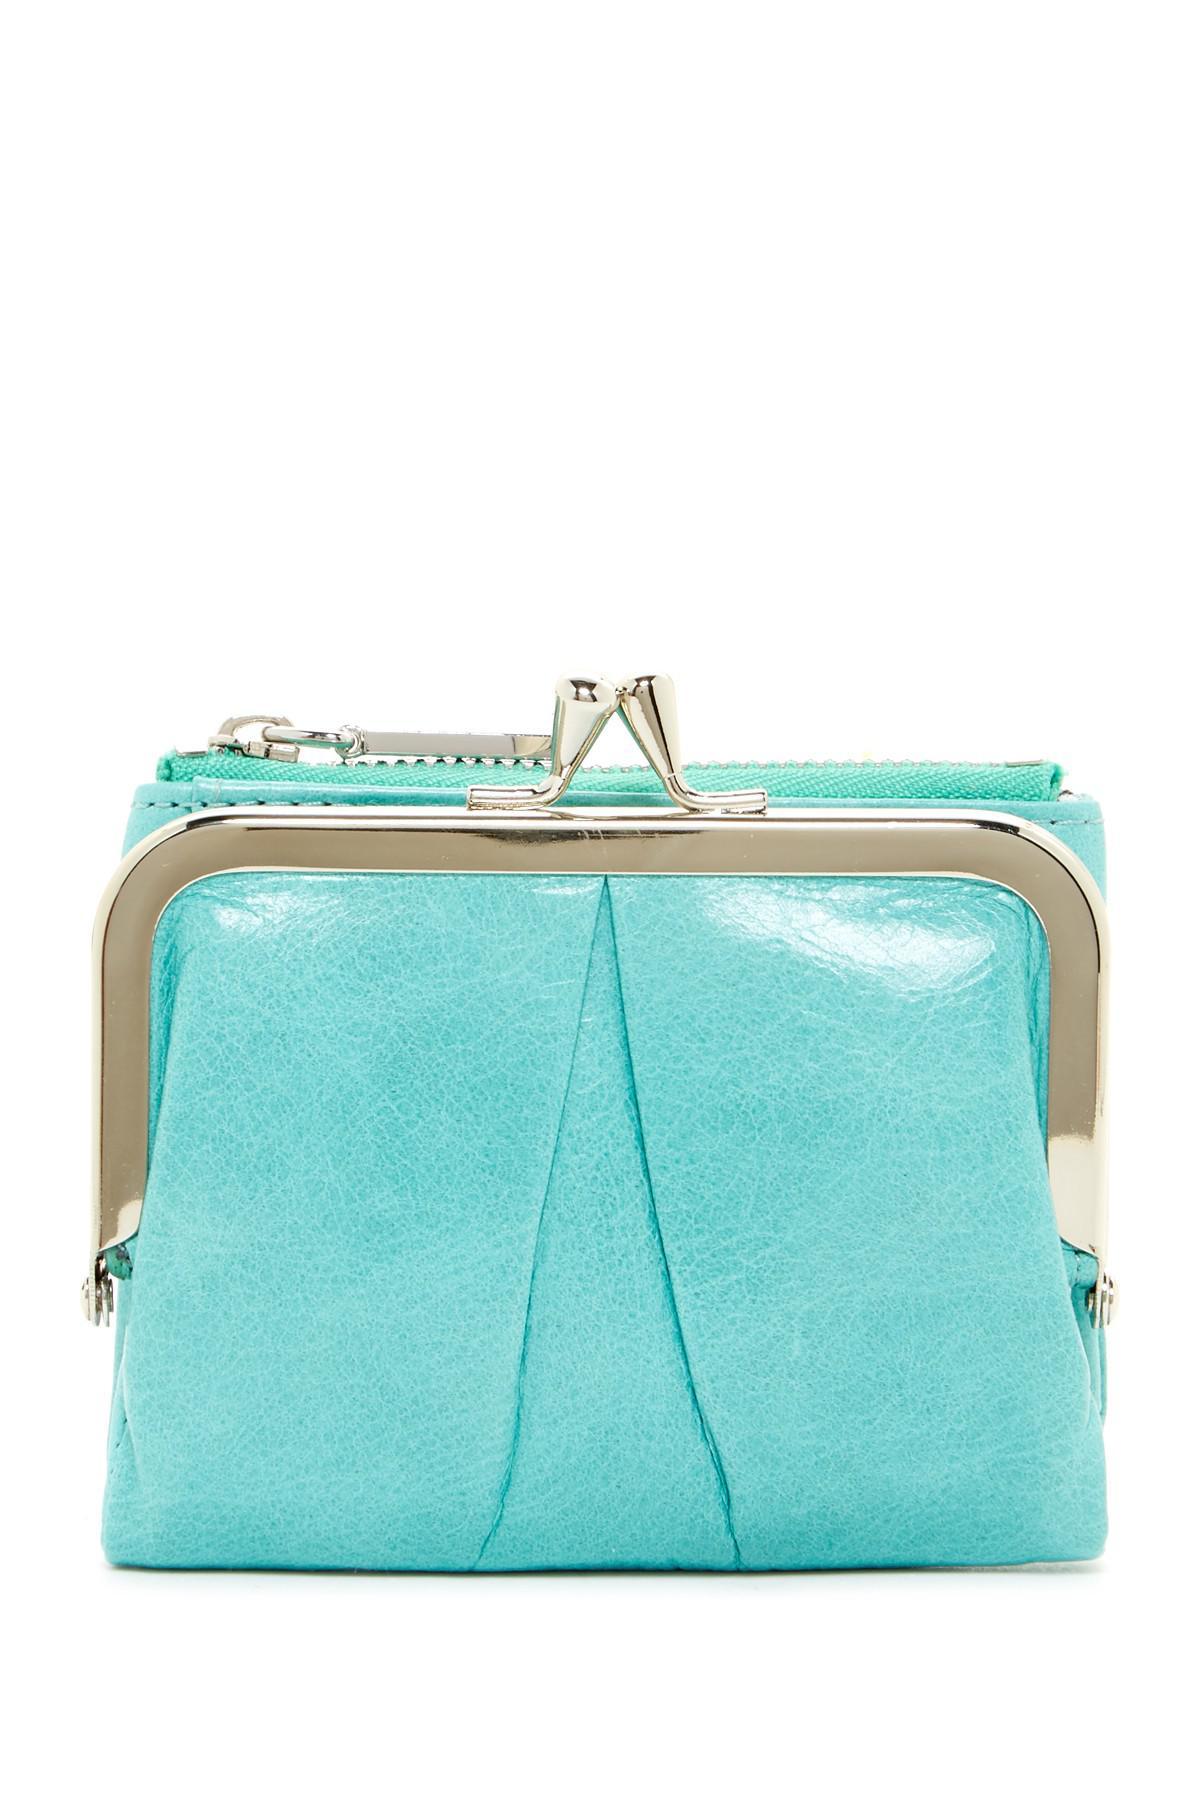 891b881be384 Lyst - Hobo Peg Leather Wallet in Blue